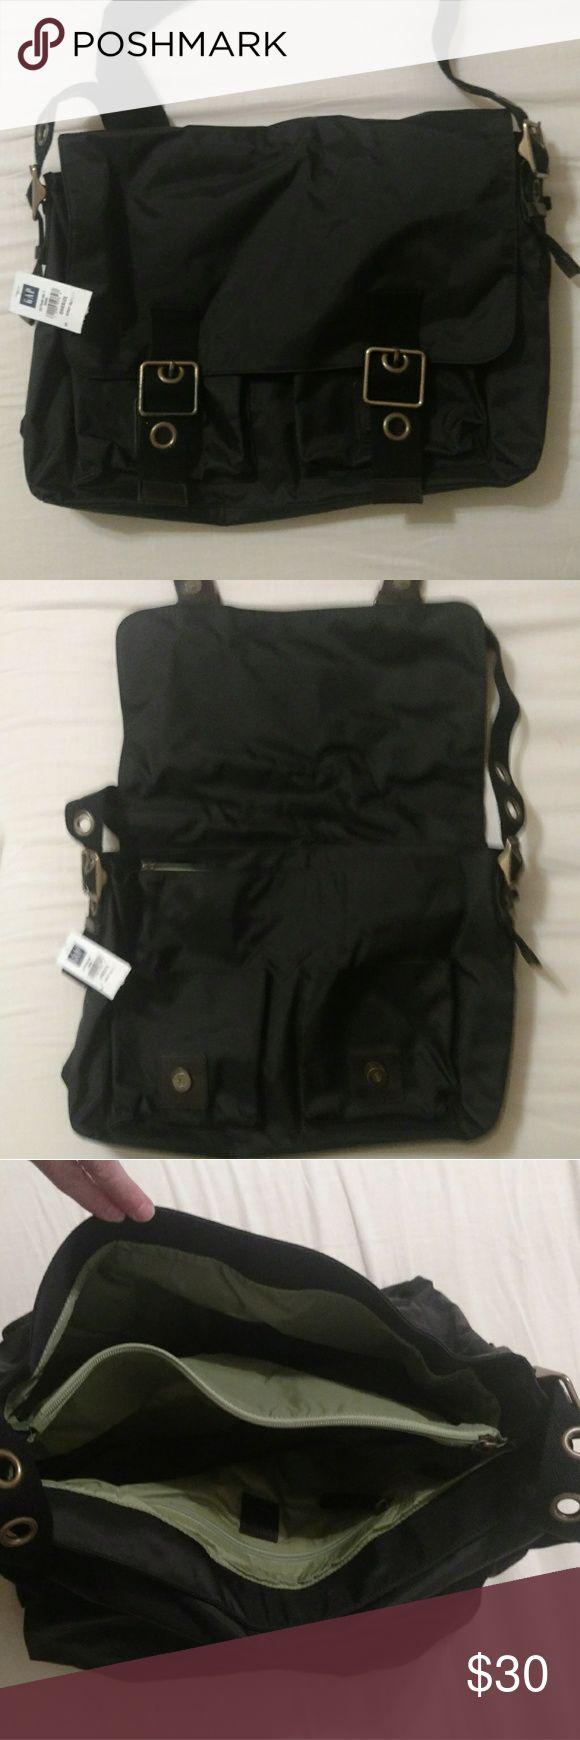 I just added this listing on Poshmark: Gap messenger bag. #shopmycloset #poshmark #fashion #shopping #style #forsale #Gap #Handbags